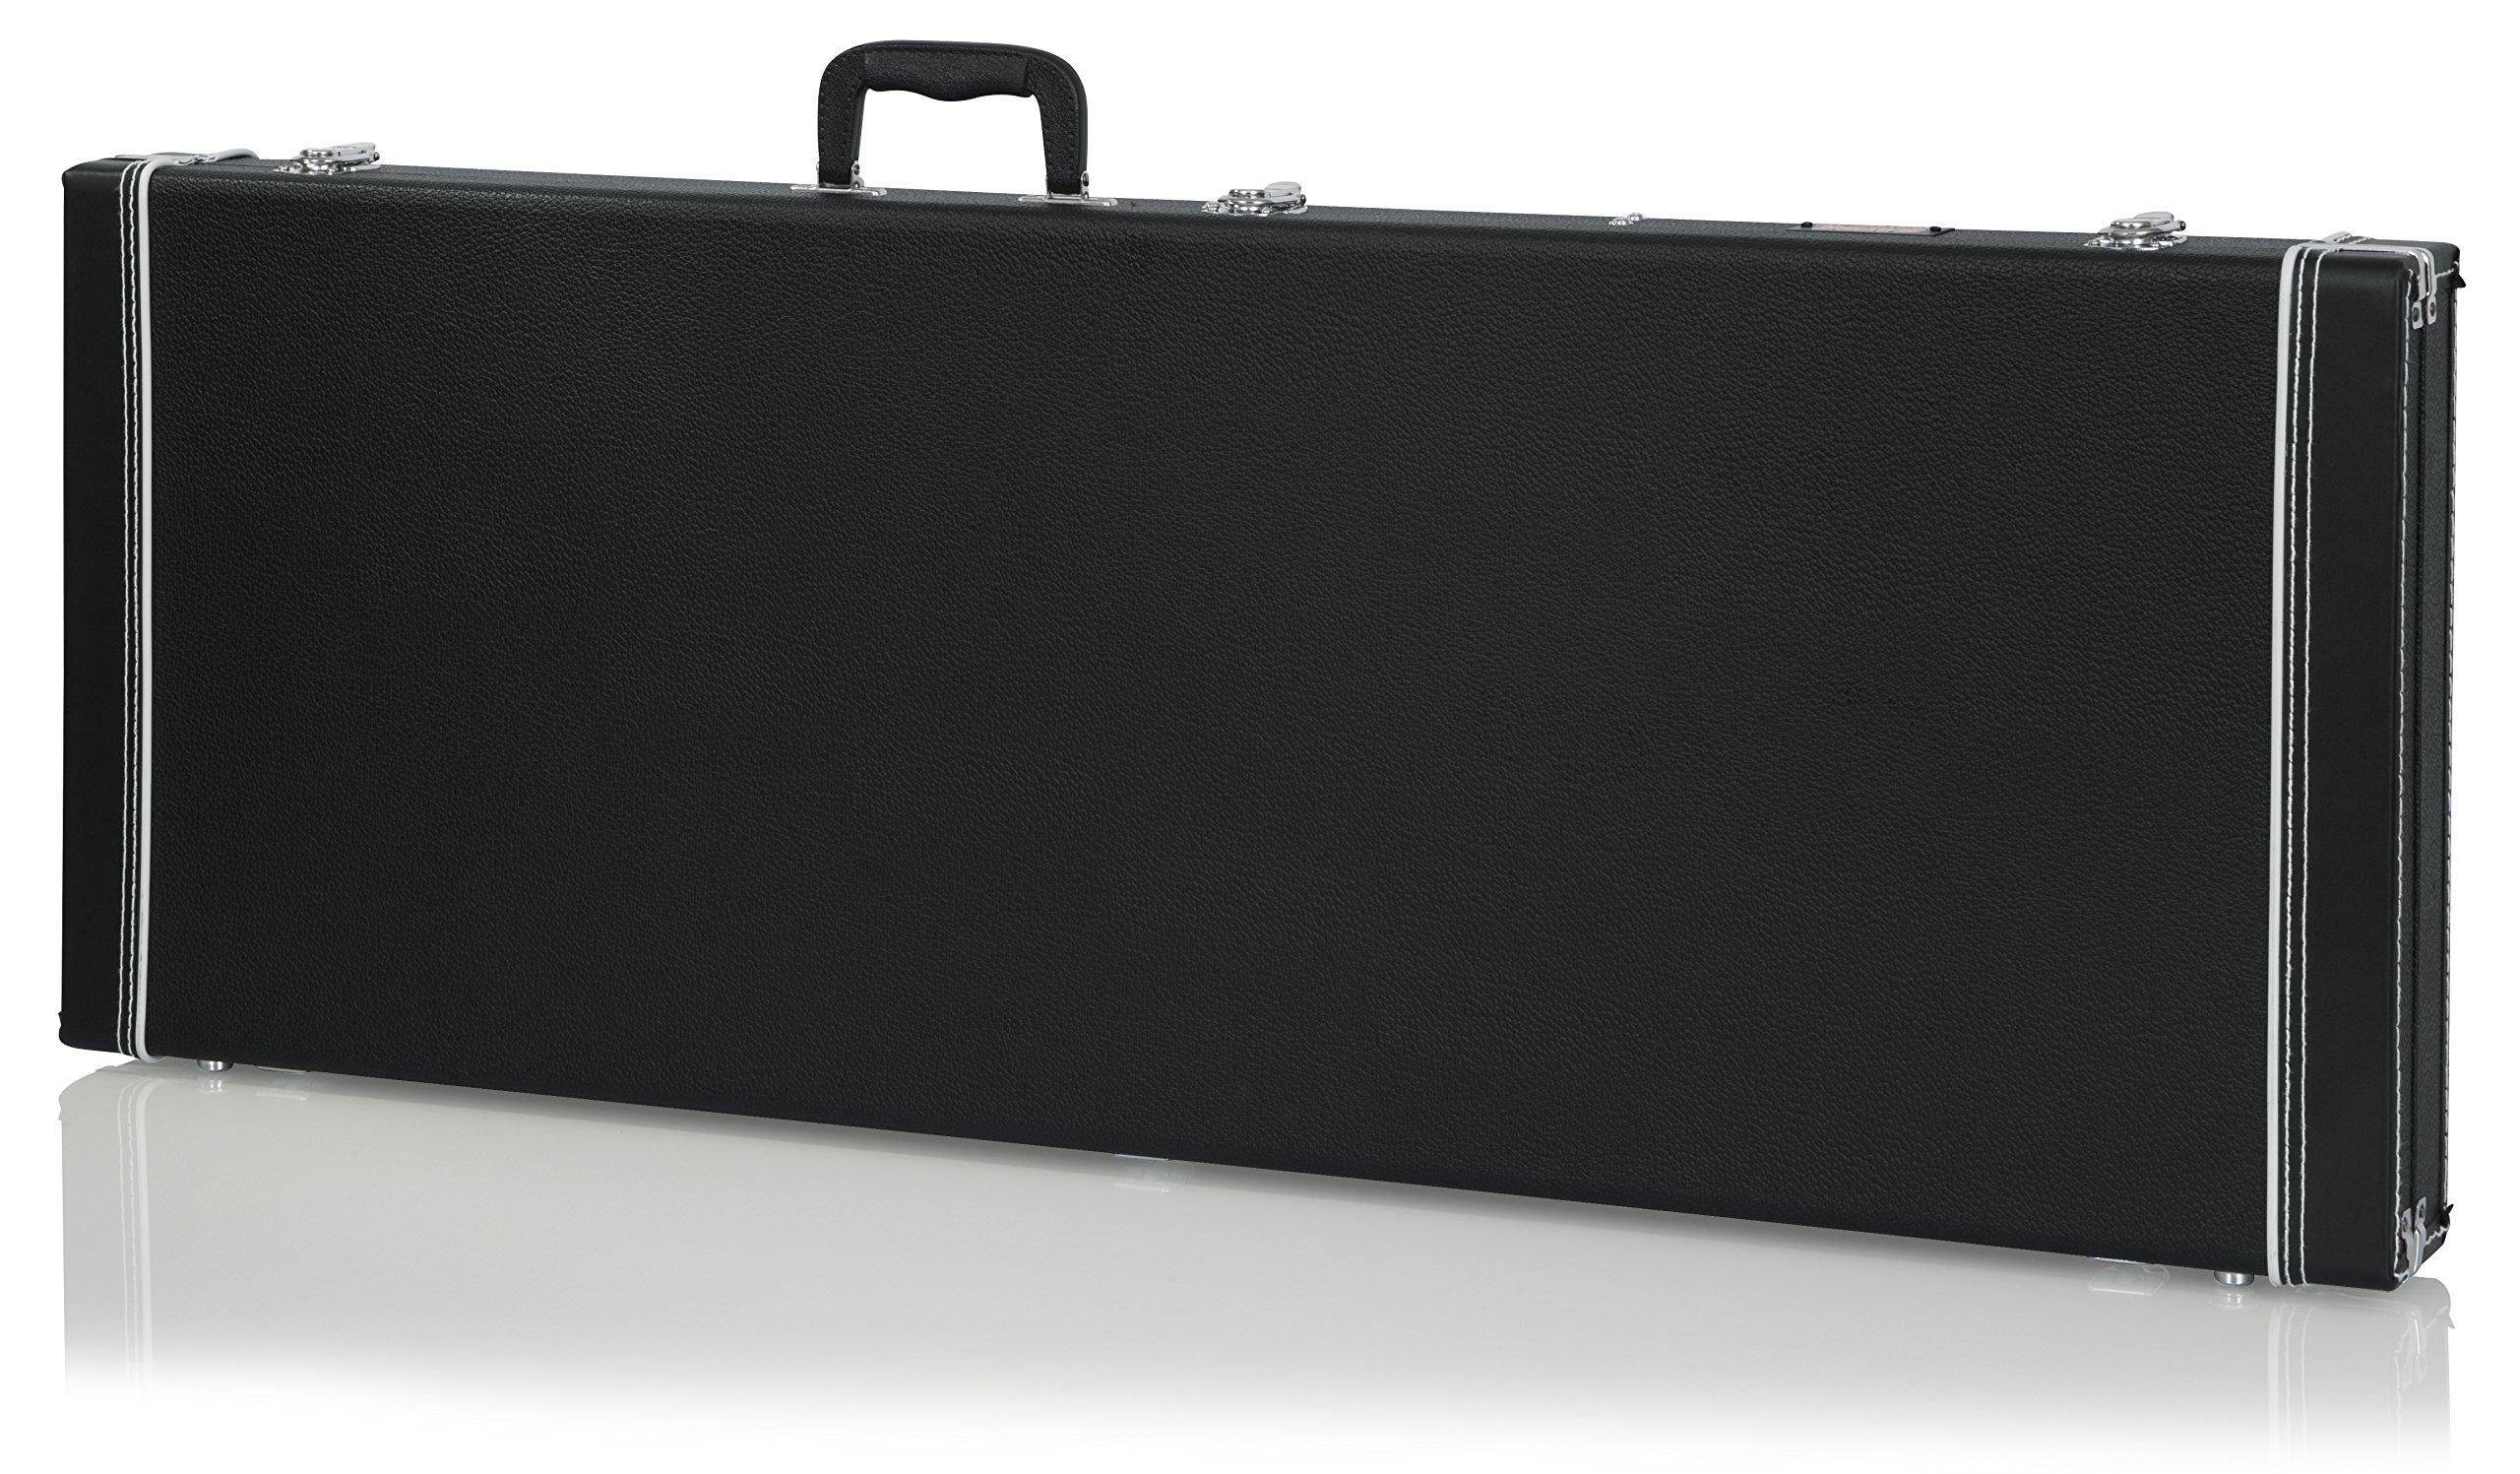 Gator Cases Deluxe Wood Case for Jaguar/Jazzmaster Style Electric Guitars (GW-JAG)